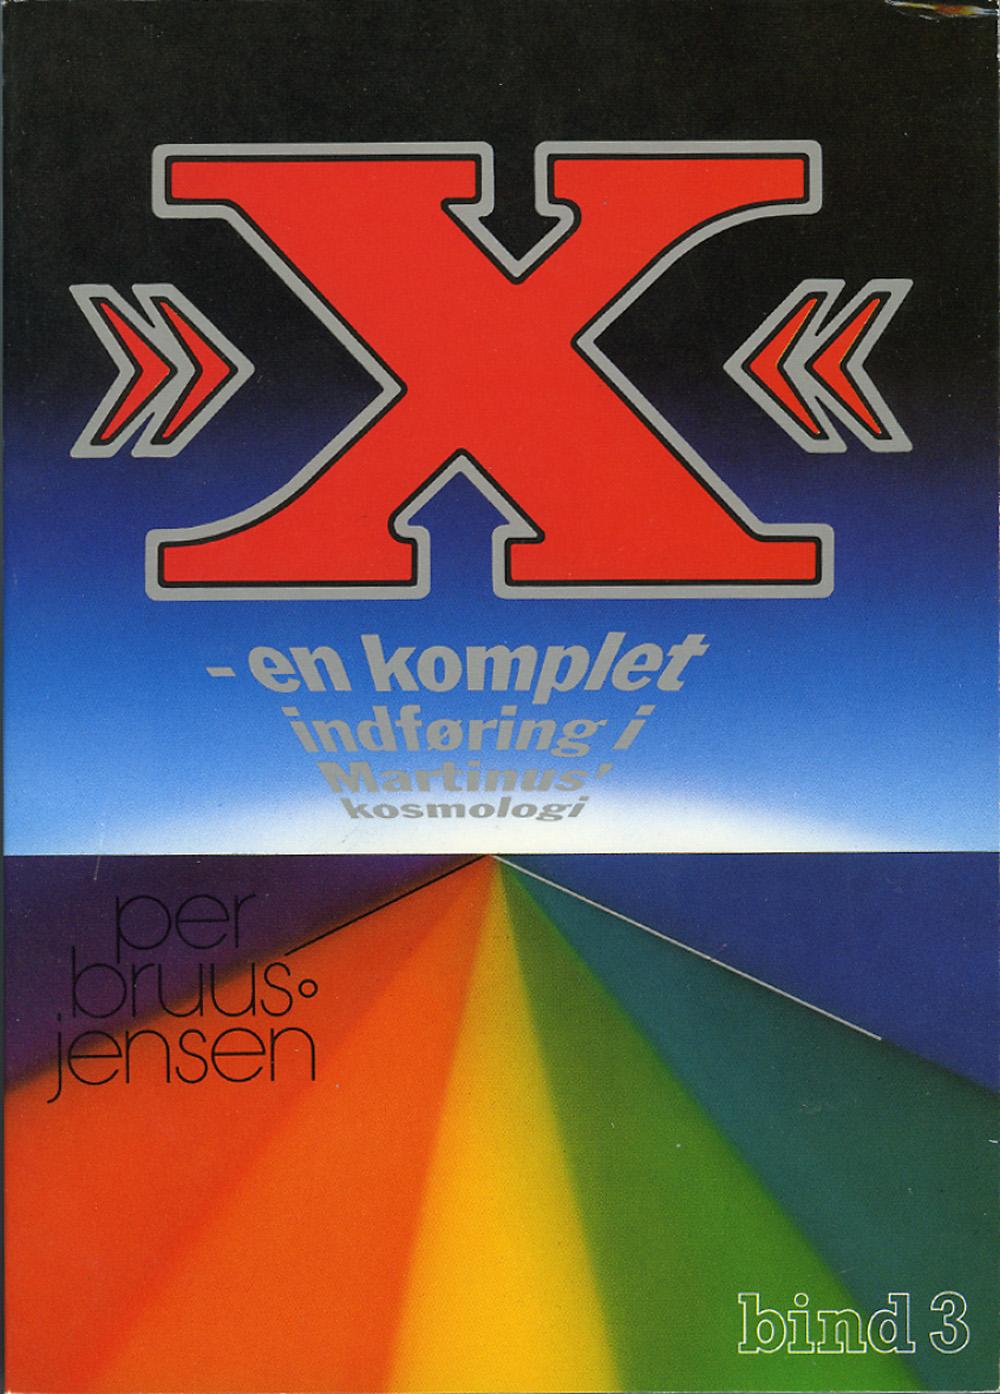 »X« : en komplet indføring i Martinus Kosmologi, 3 av 4 av Per Bruus-Jensen